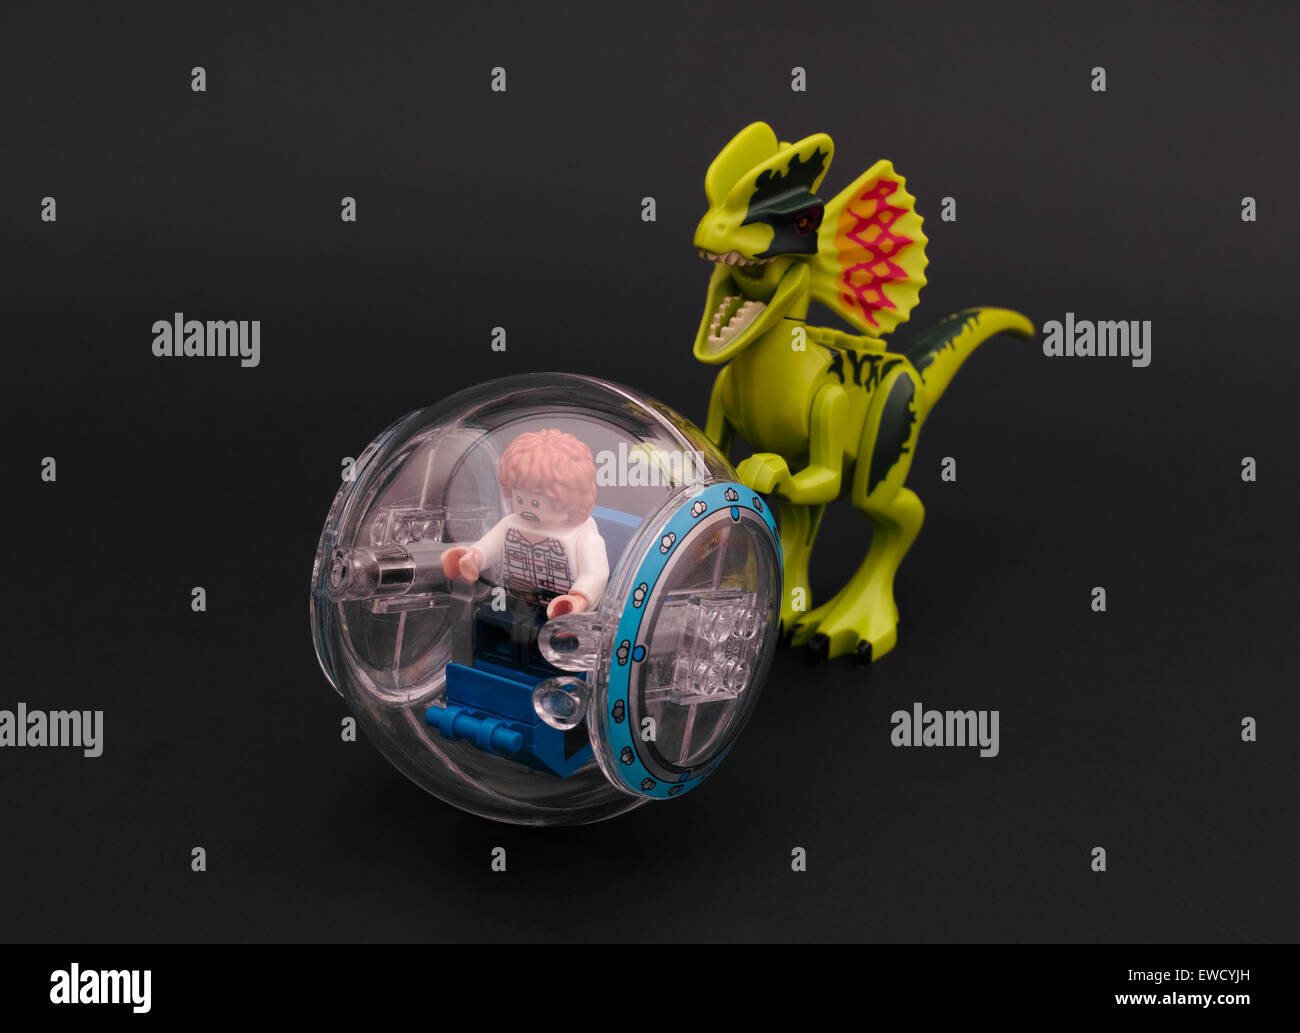 Tambov, Rusia - Junio 23, 2015 Lego Jurassic Park. Gris en un gyrosphere minifigure perseguido por un dilophosaurus. Imagen De Stock